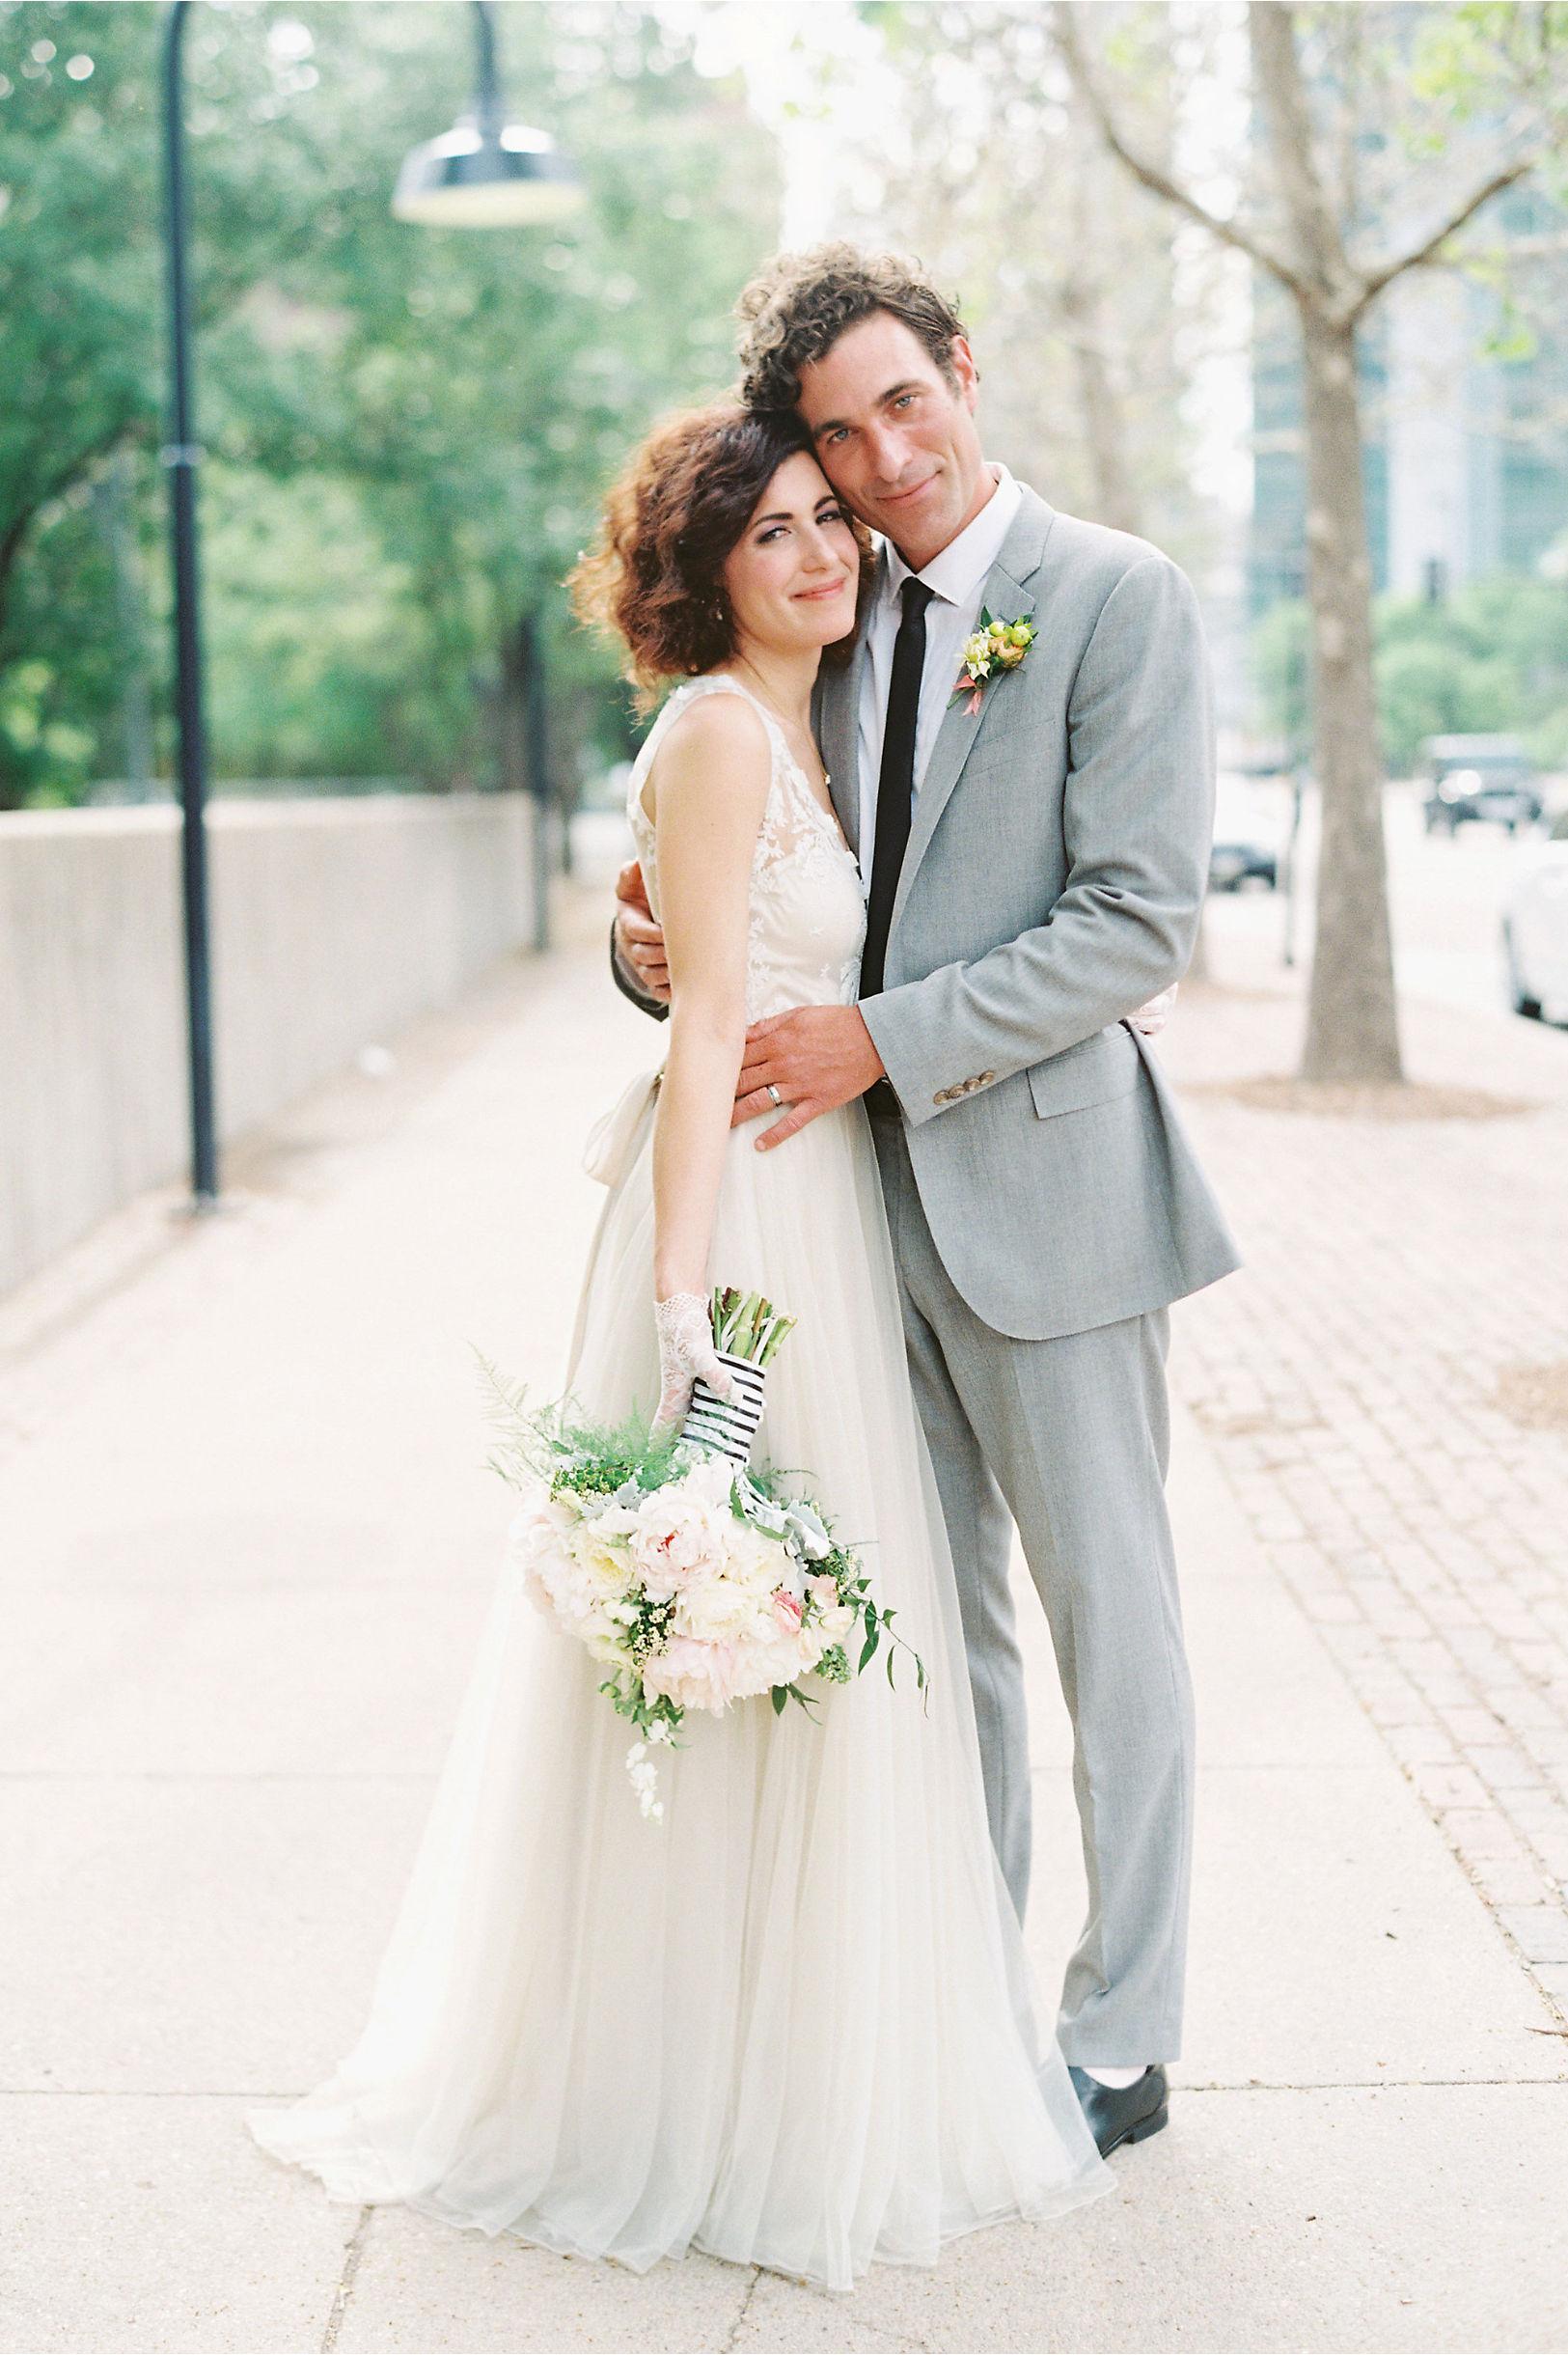 Onyx Bridesmaid Dresses | Dress images